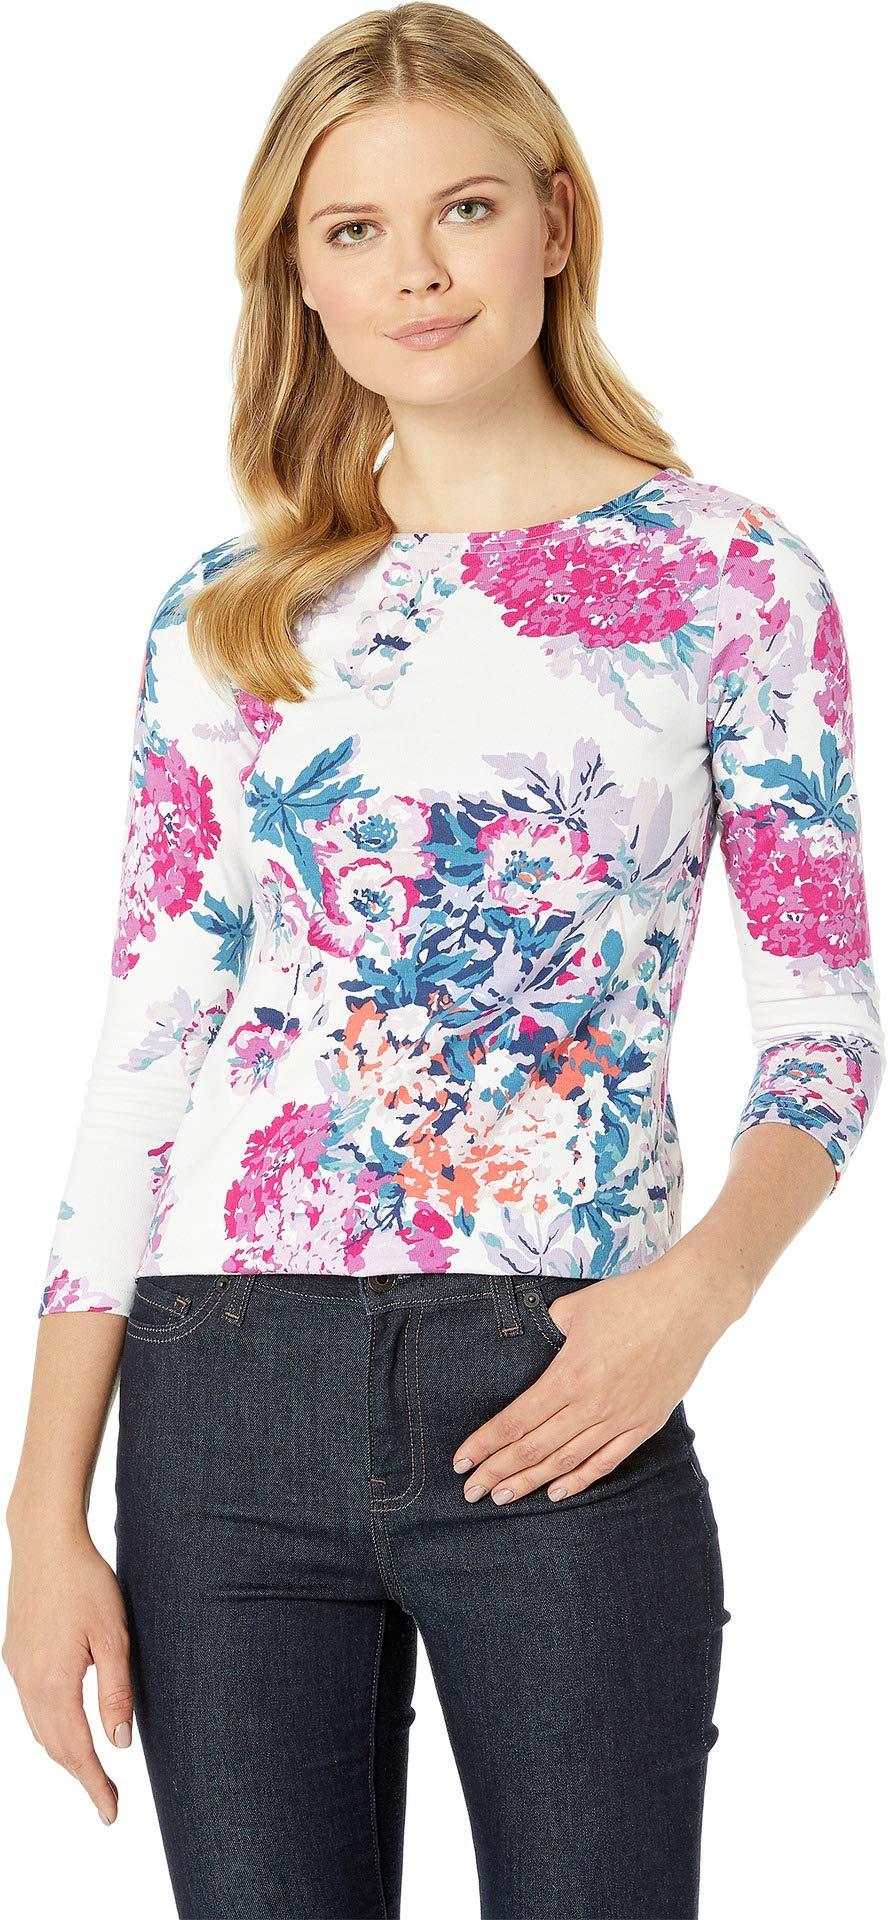 Joules Women's Harbour Print Jersey Top Cream Floral 2